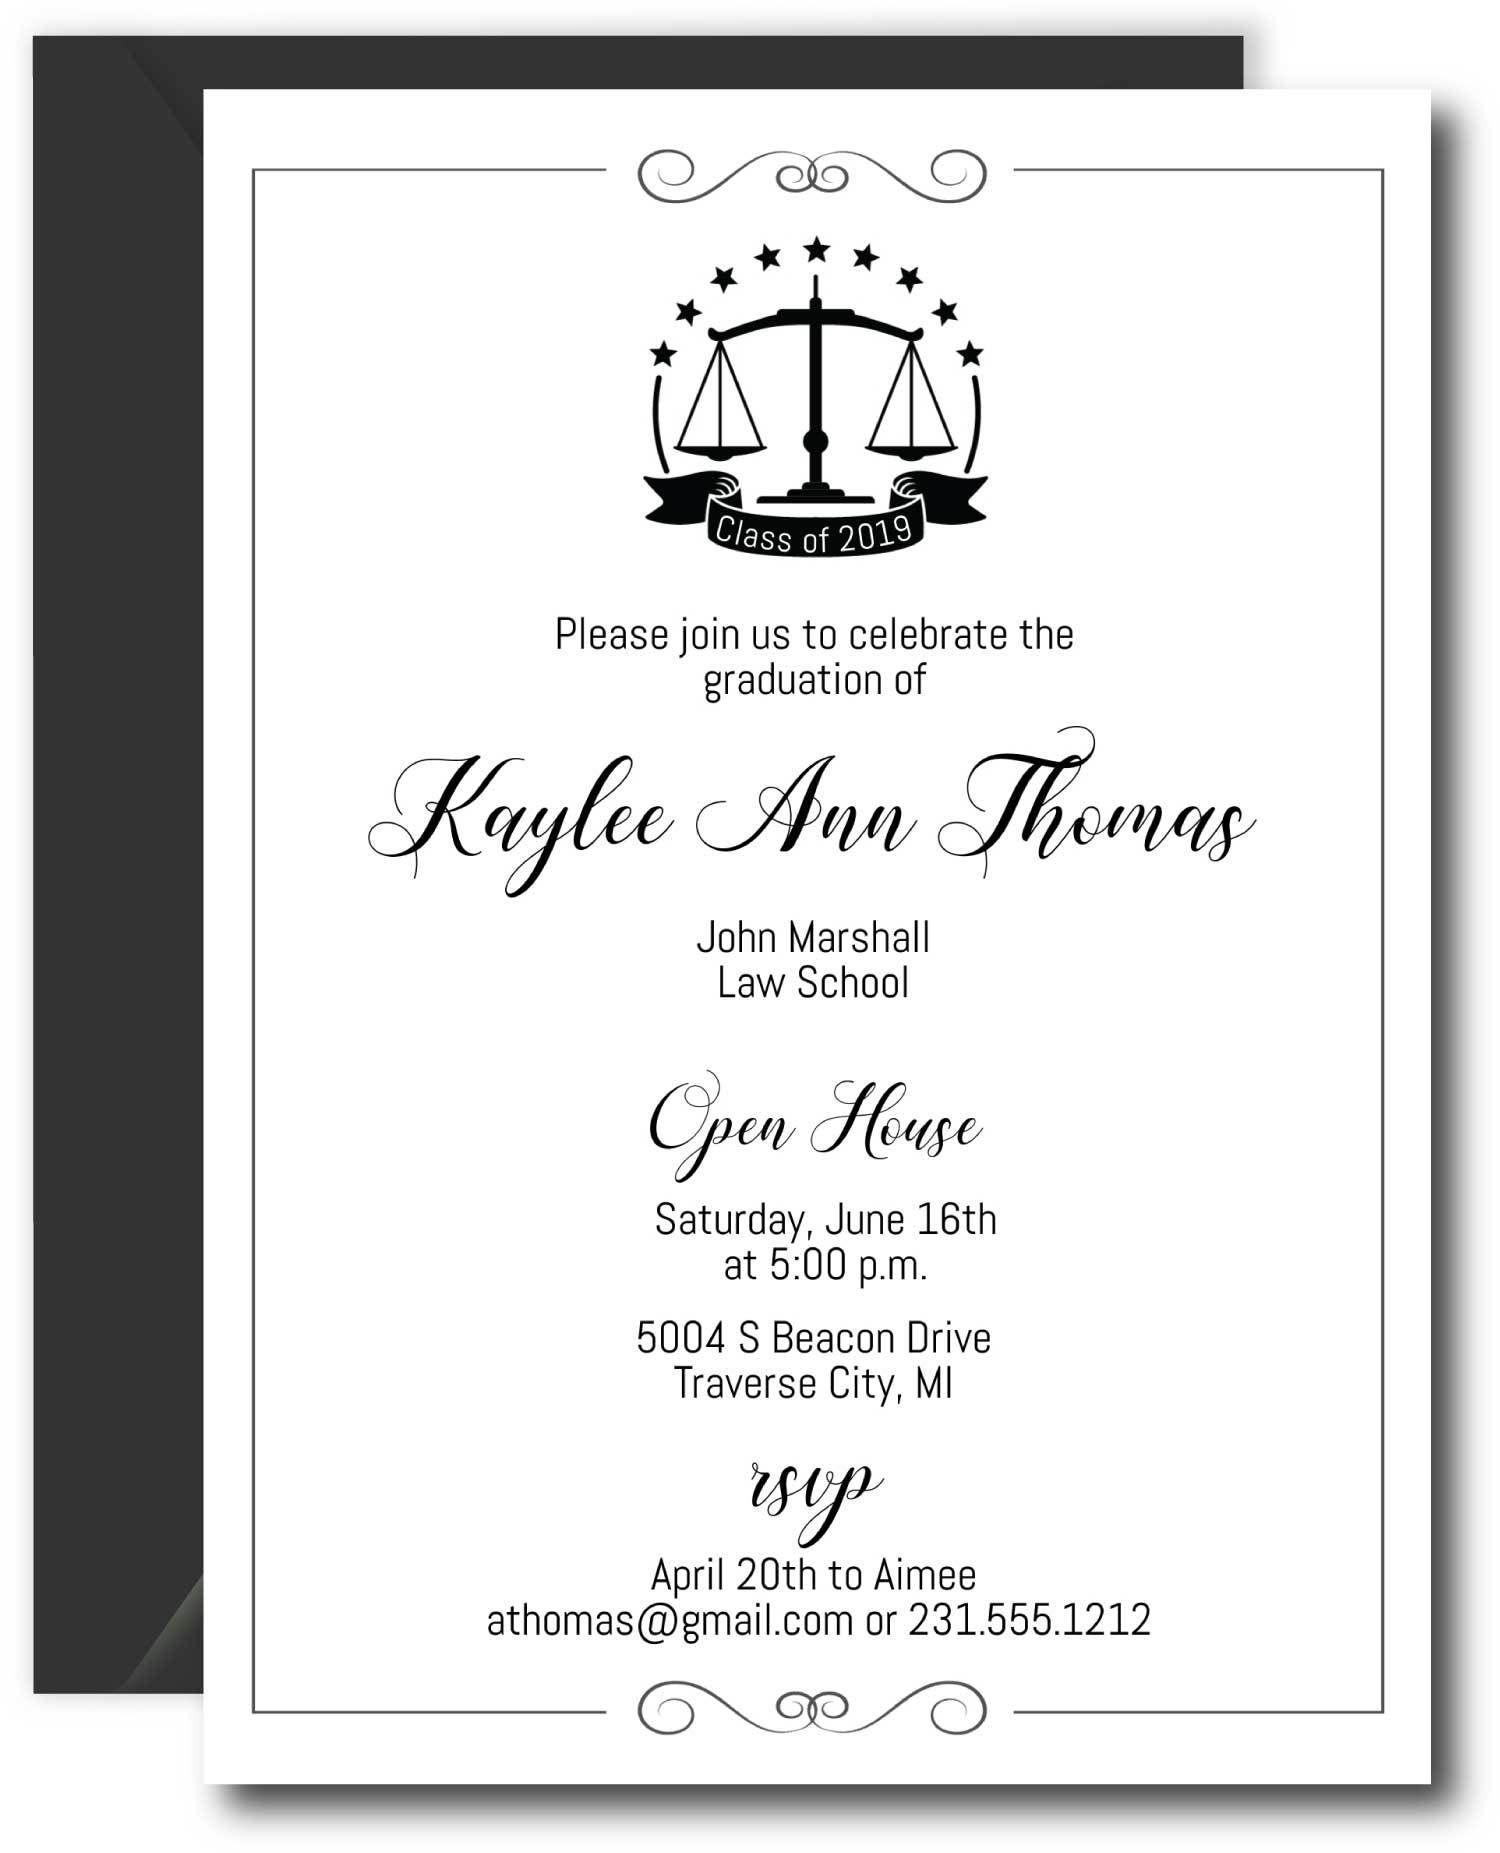 Law Graduation Invitations Graduation Invitations School Graduation Announcements Graduation Party Invitation Wording